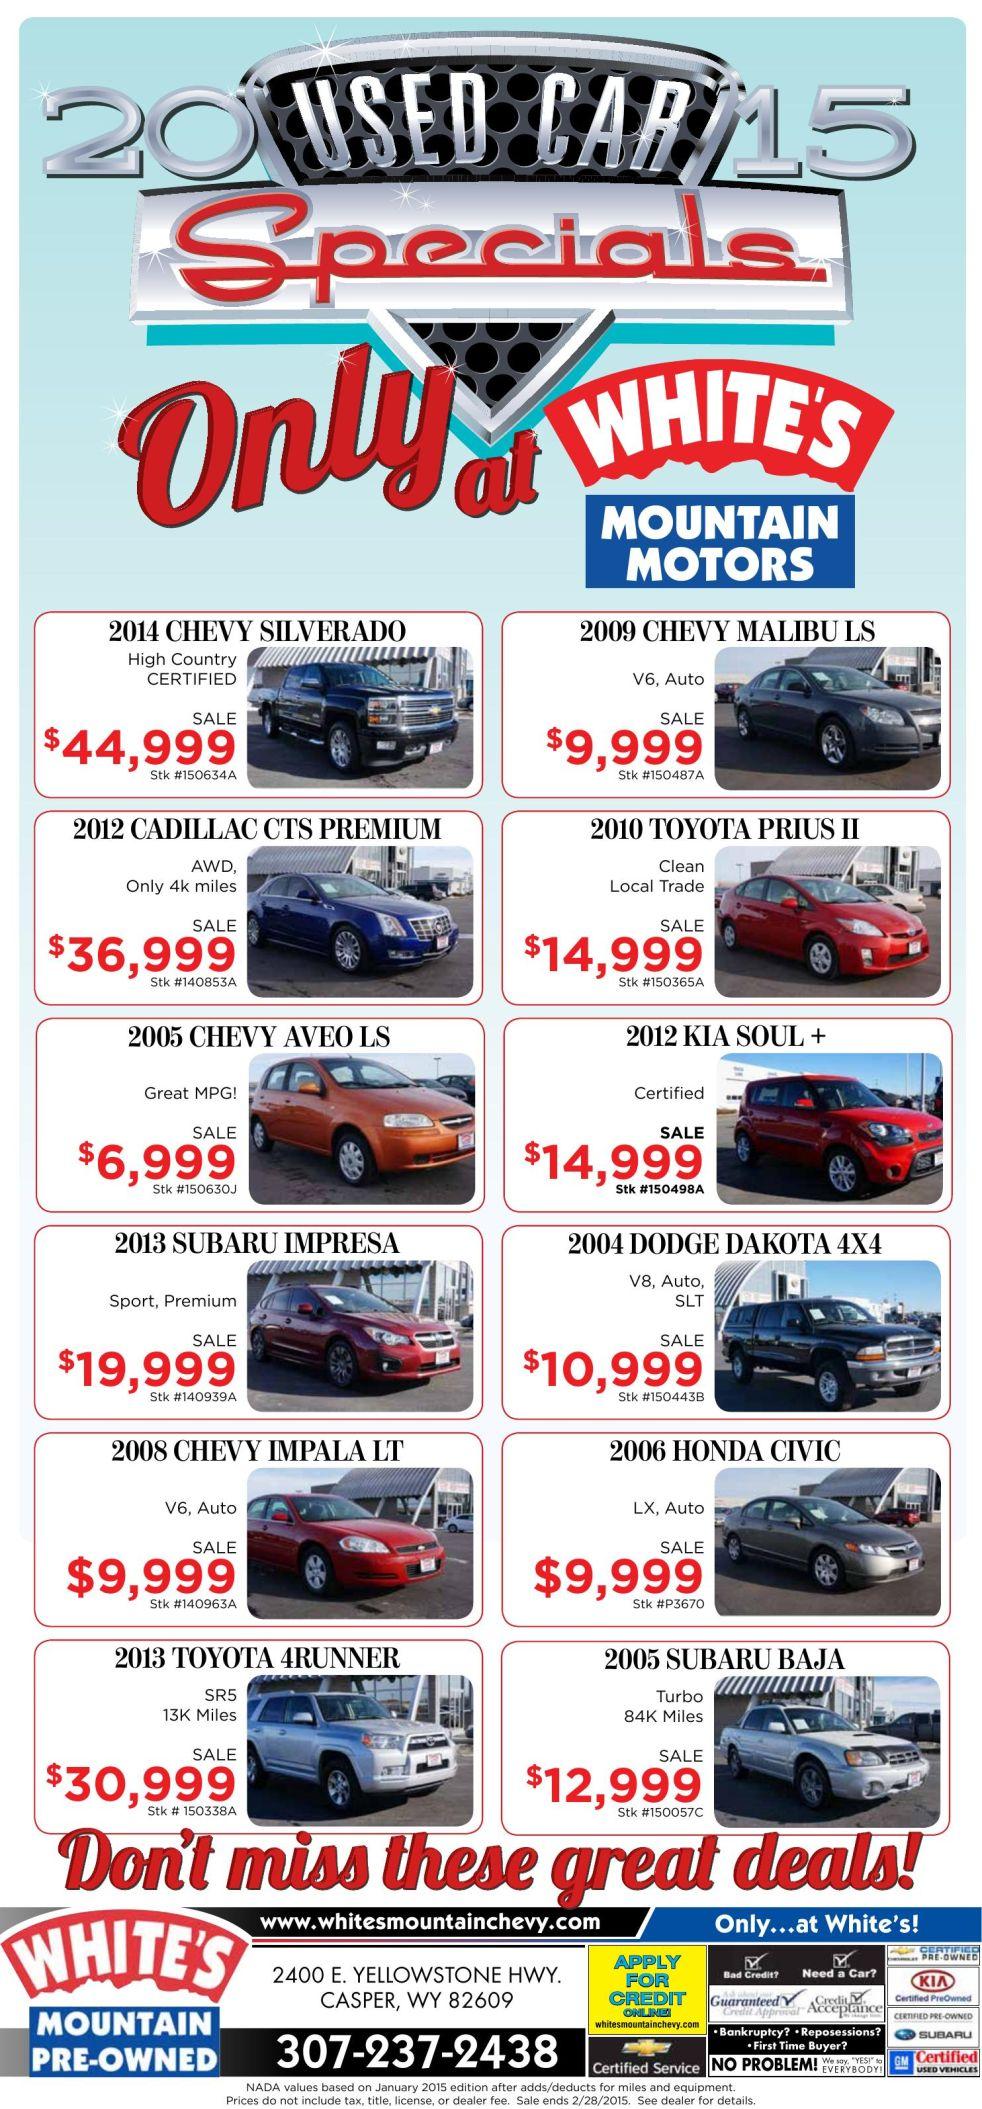 2015 Used Car Specials!